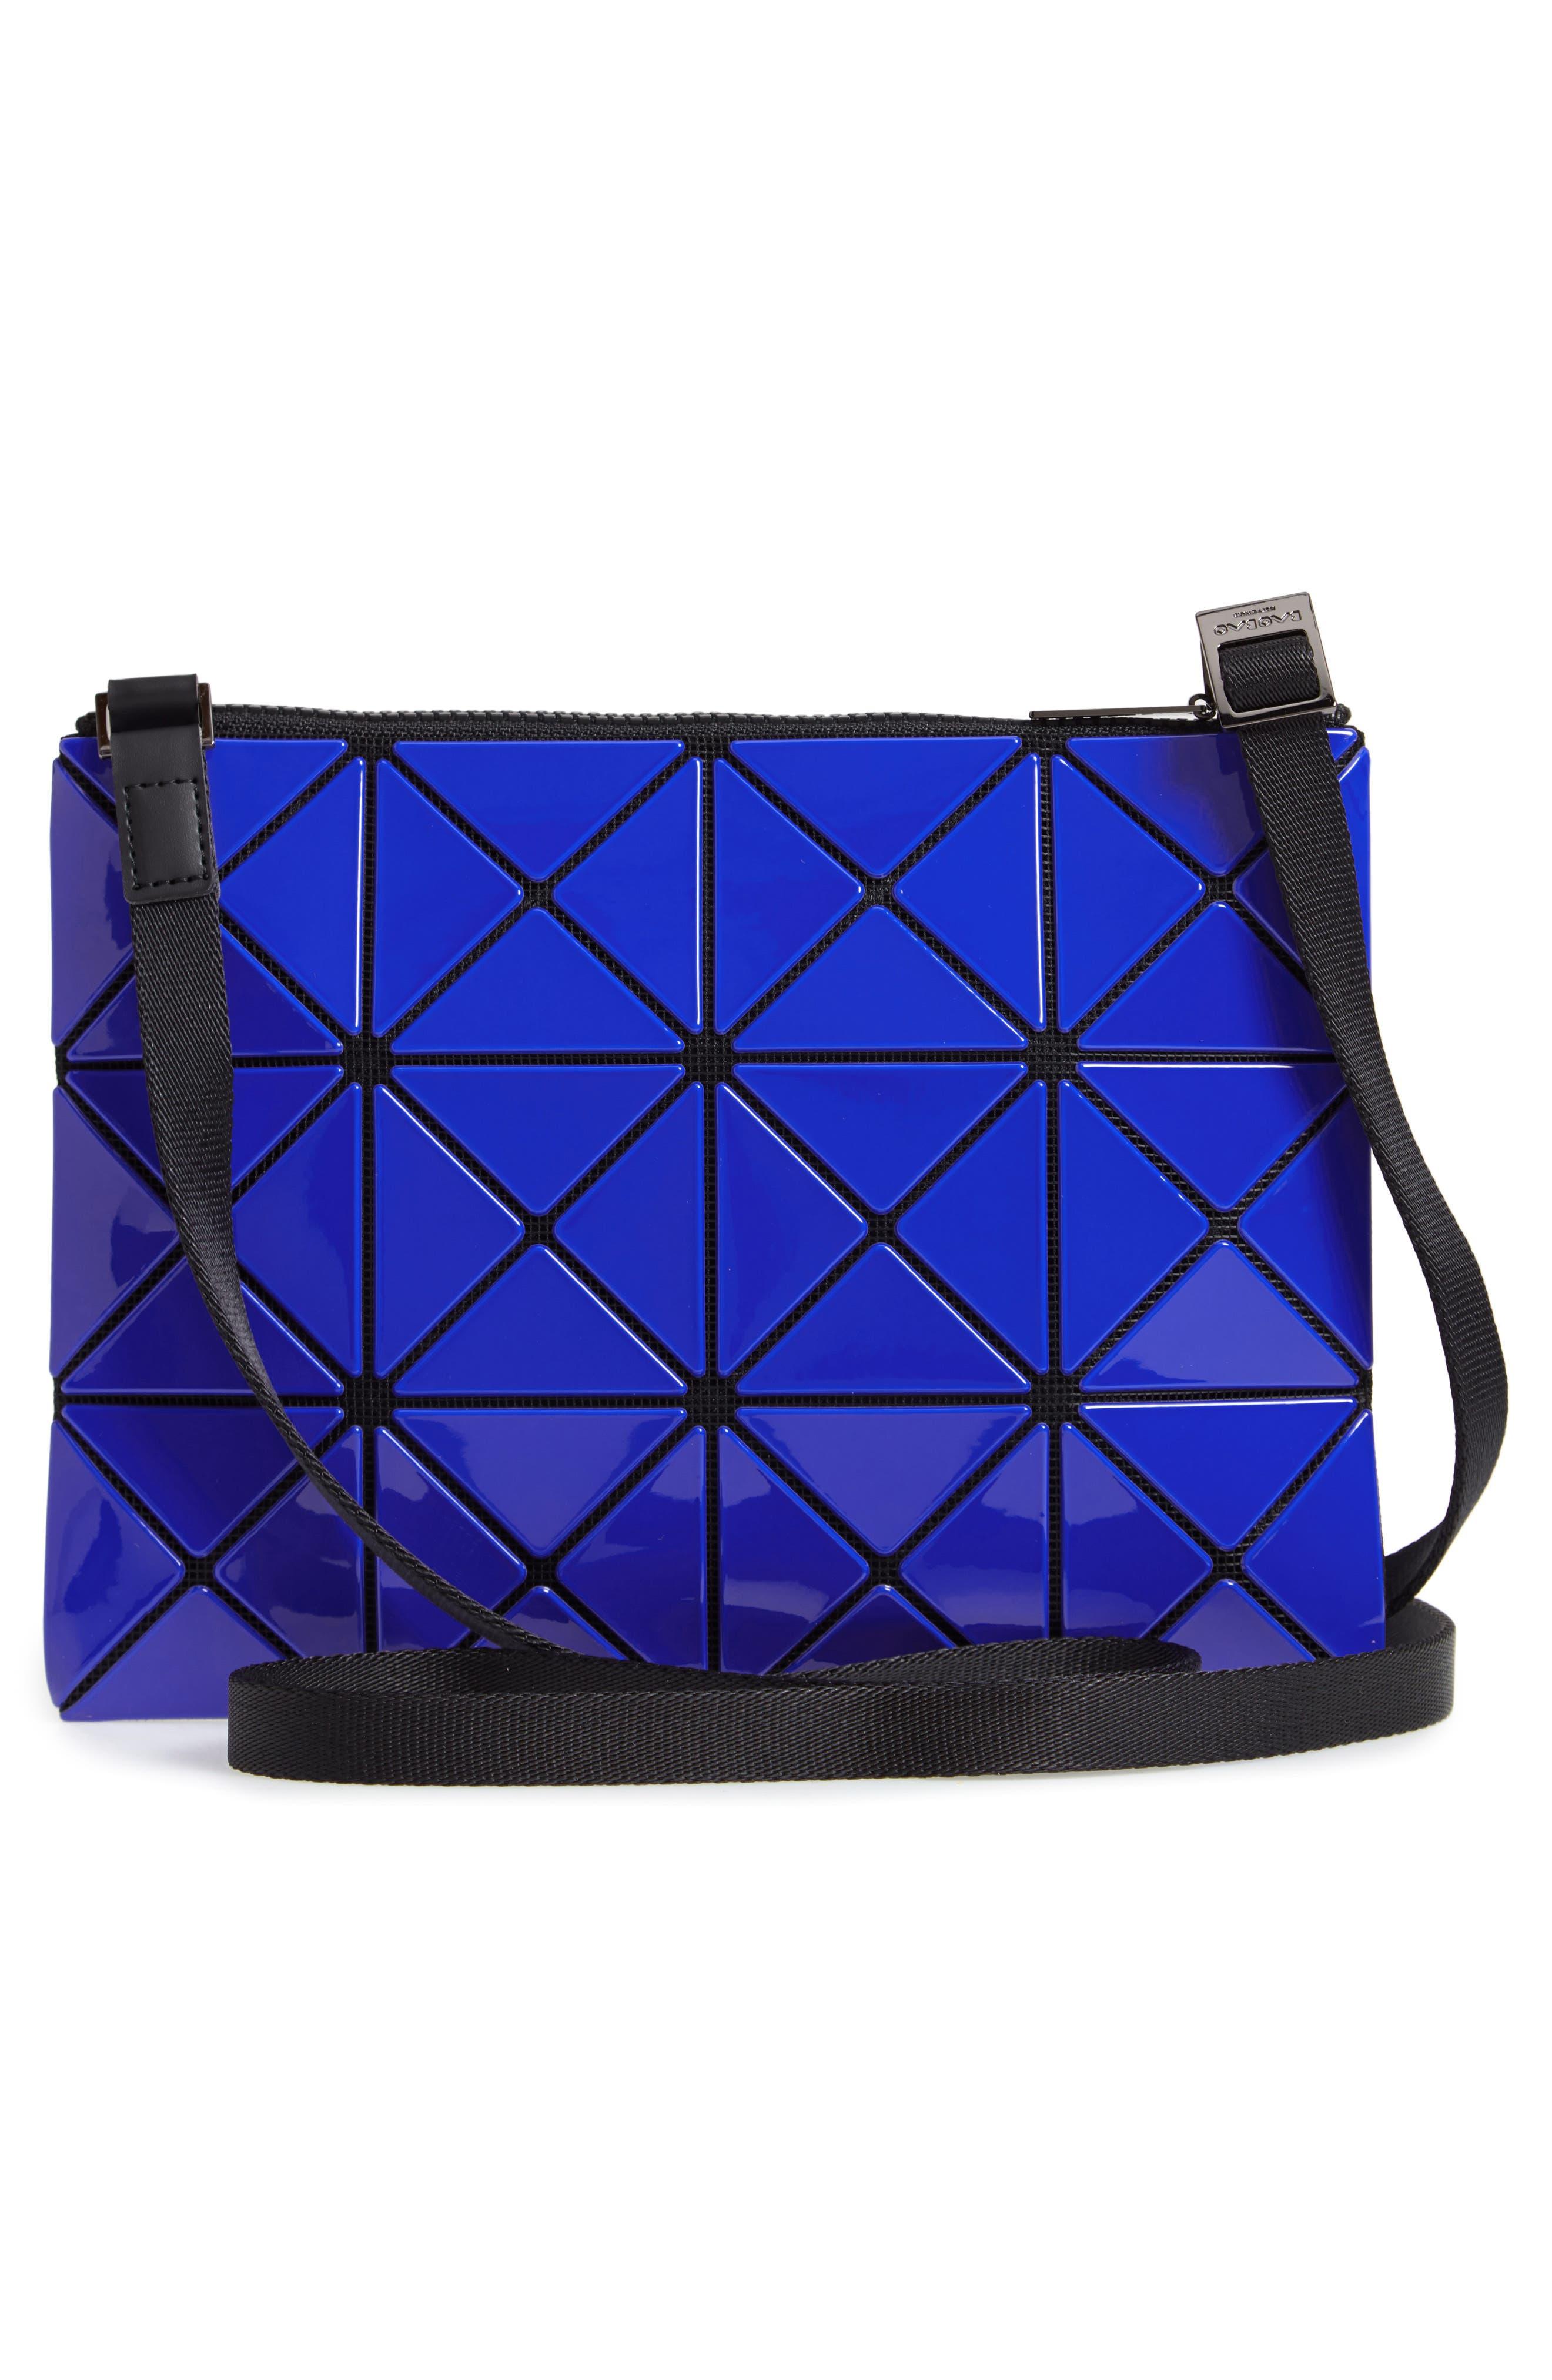 Lucent Two-Tone Crossbody Bag,                             Alternate thumbnail 5, color,                             Blue/ Dark Blue